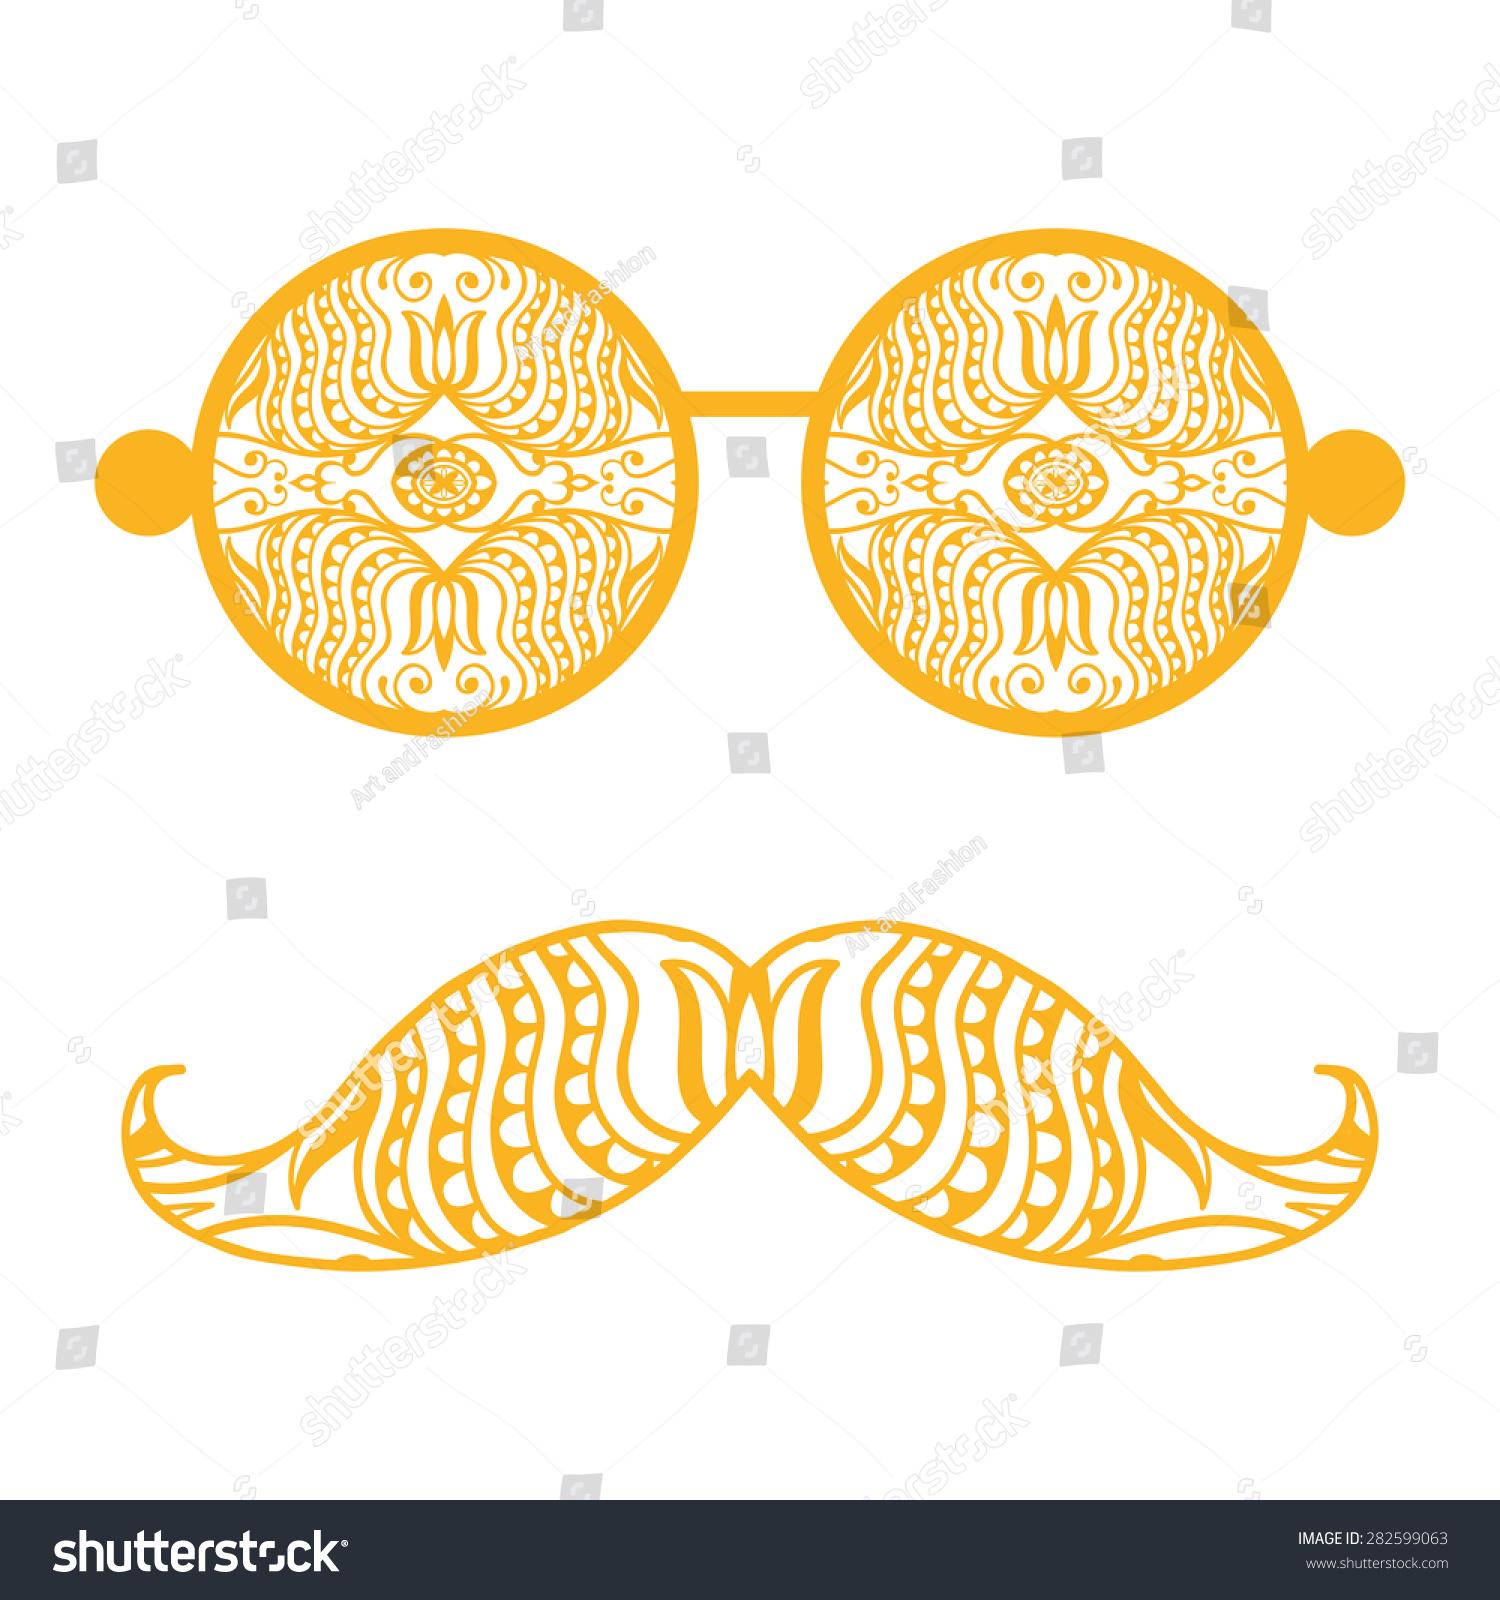 Design t shirt arabic - Retro Hipster Sunglasses With Ethnic Arabic Ornament Print For T Shirt Card Design